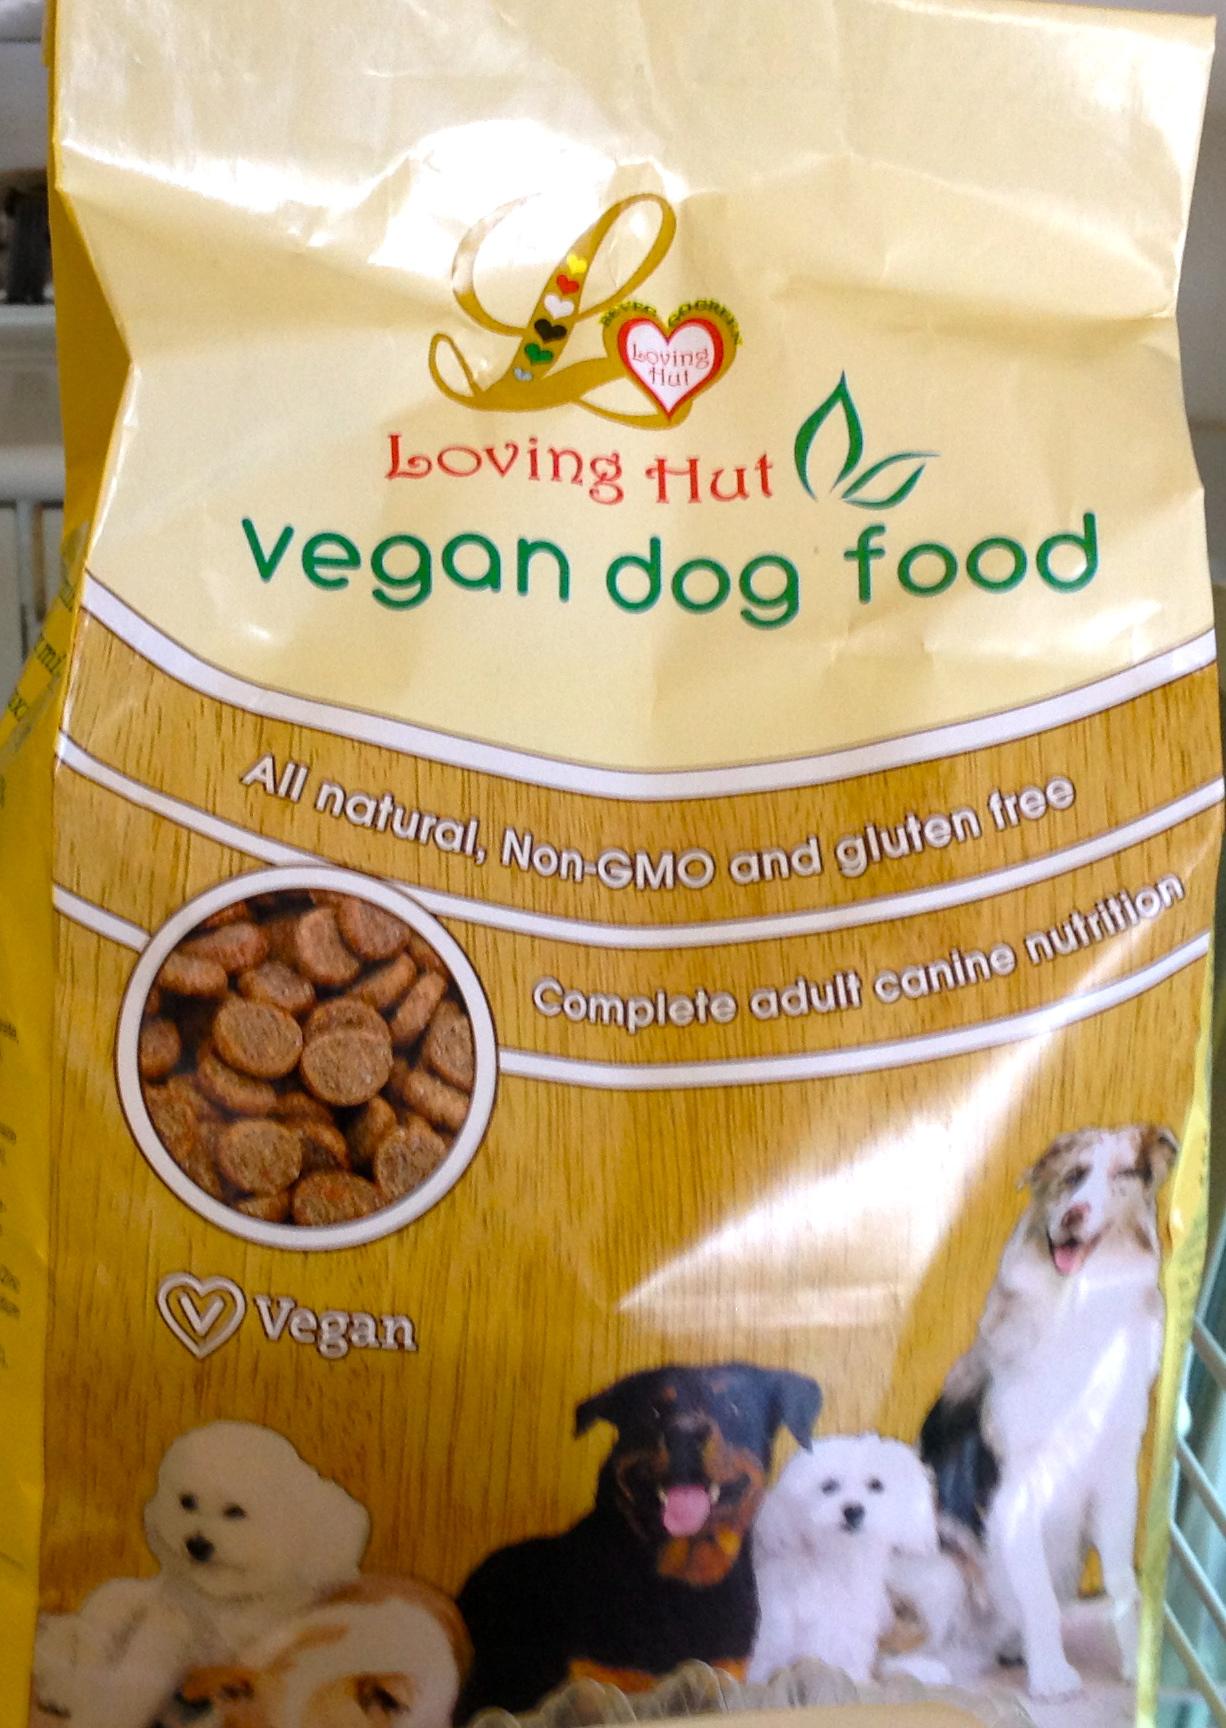 Vegan dog food archives the fussy fork loving hut dog food forumfinder Gallery